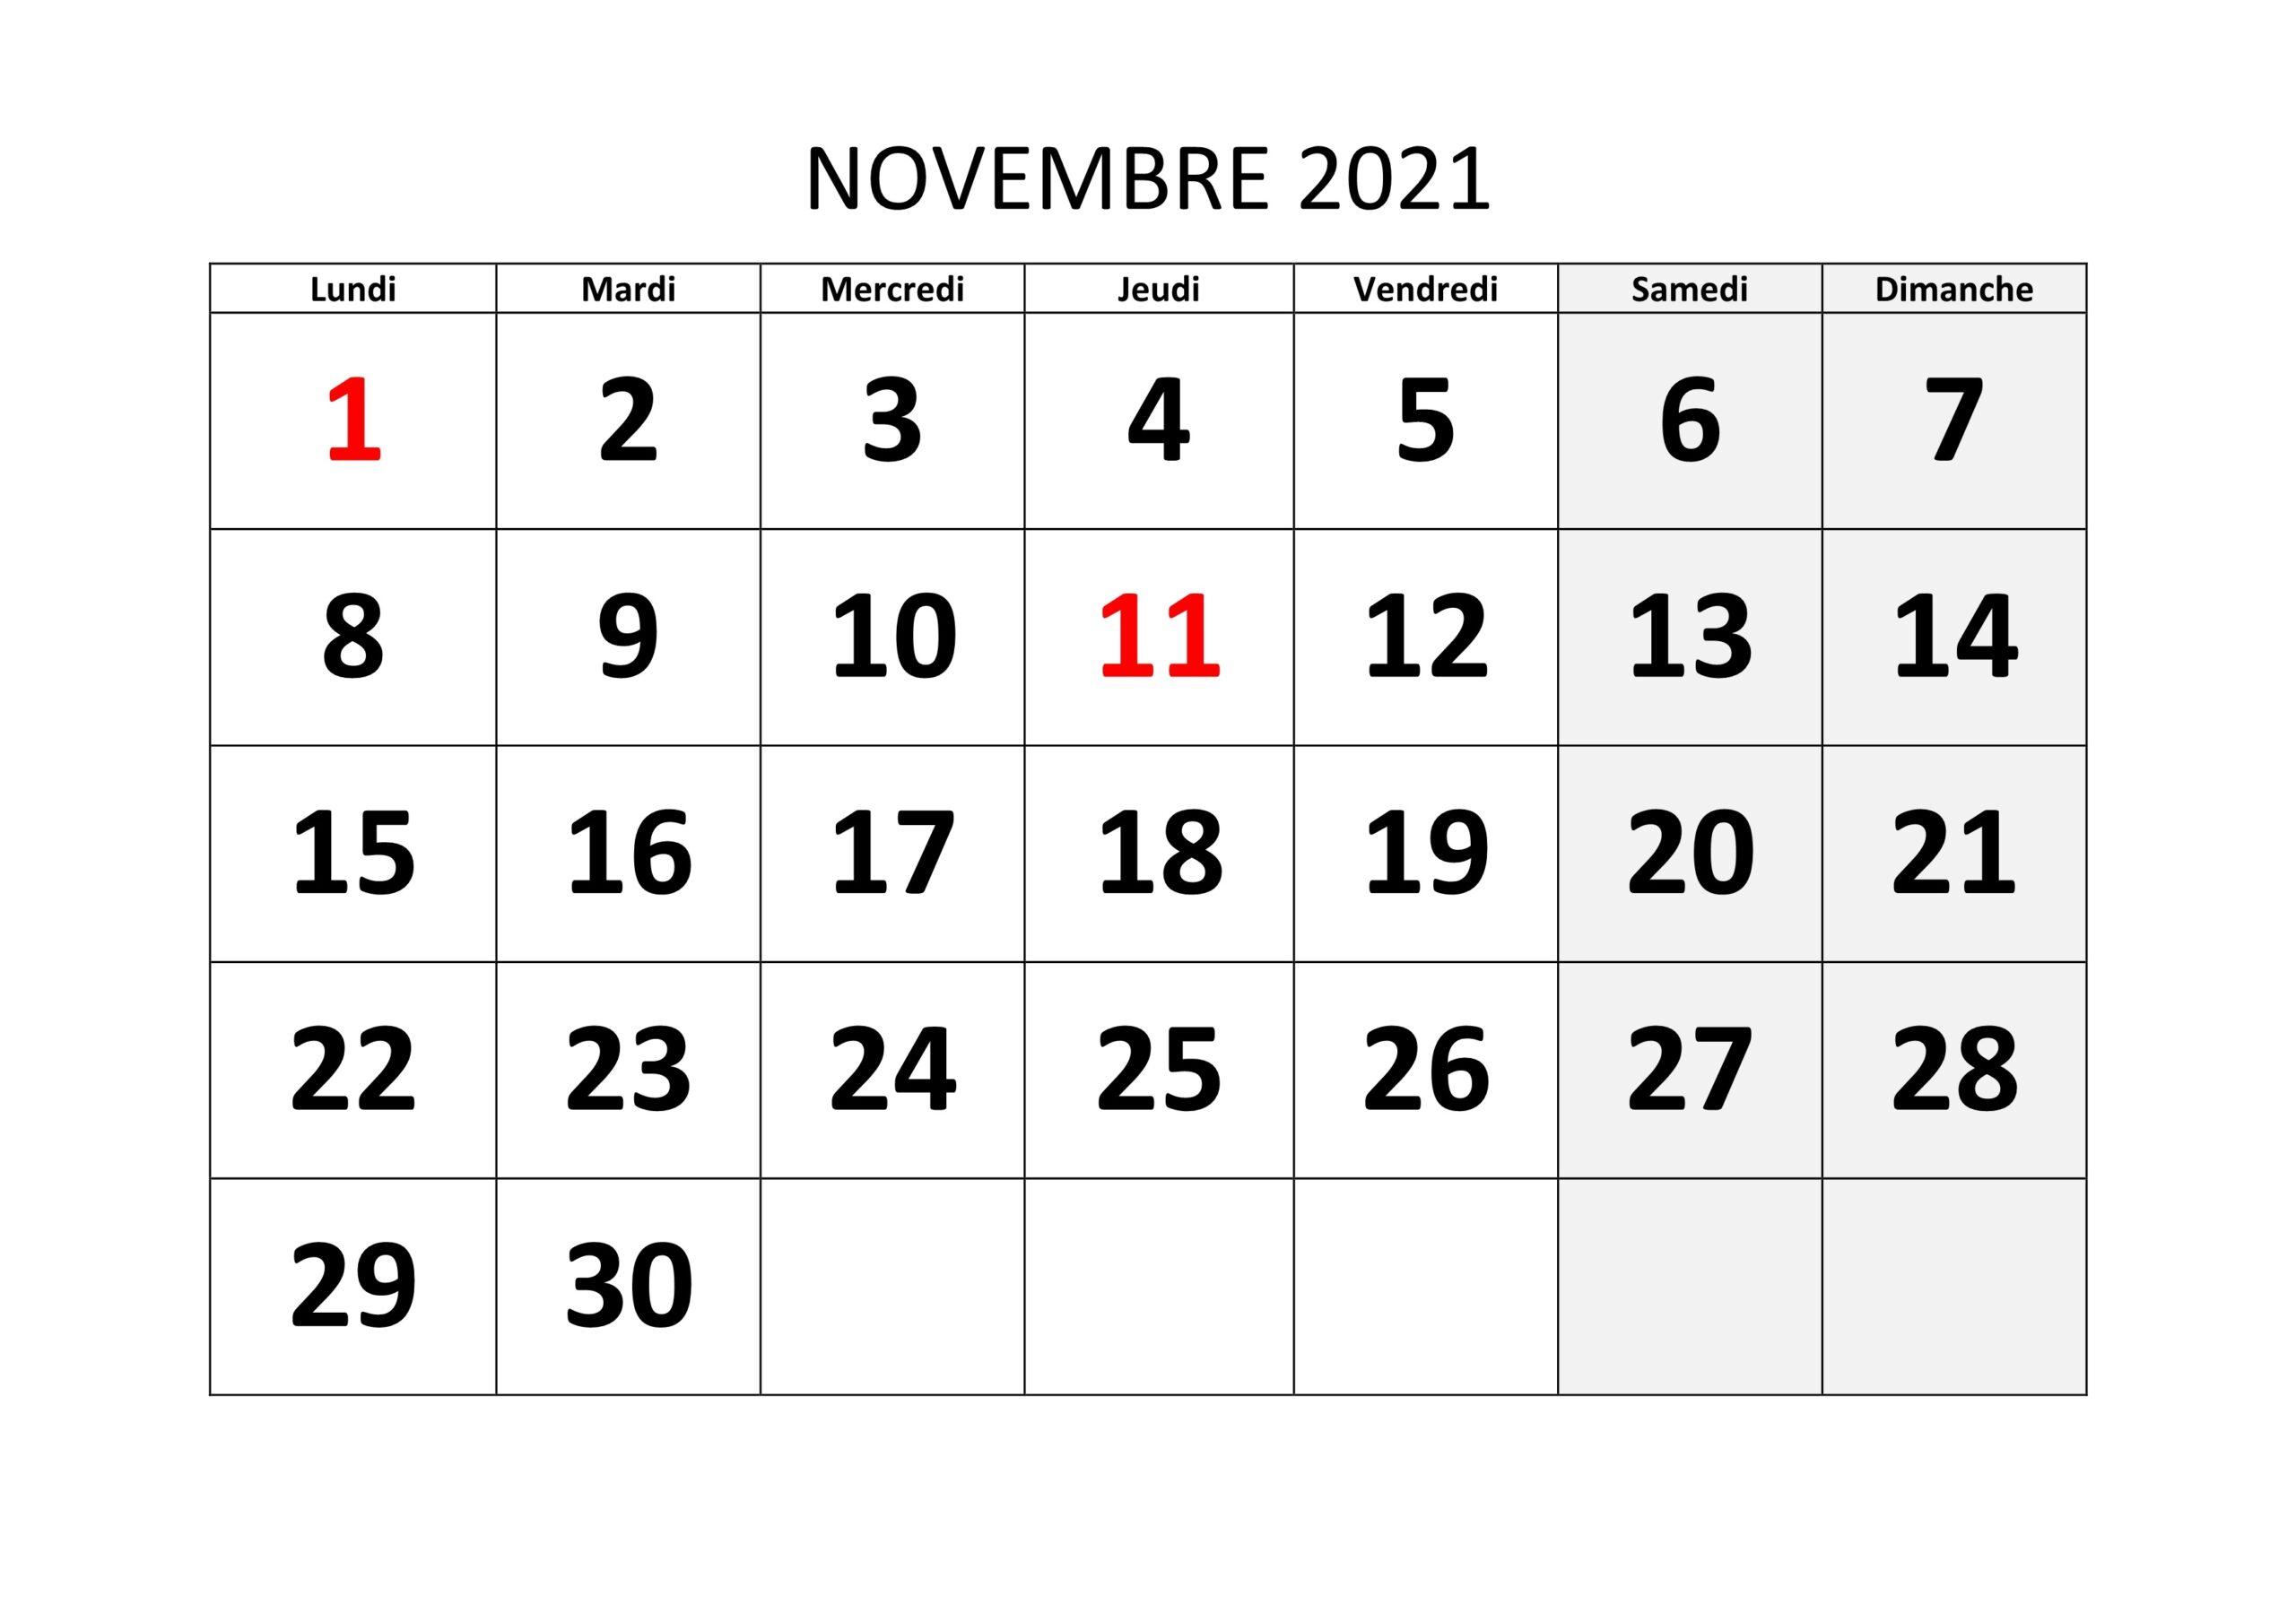 Calendrier Novembre 2021 Excel